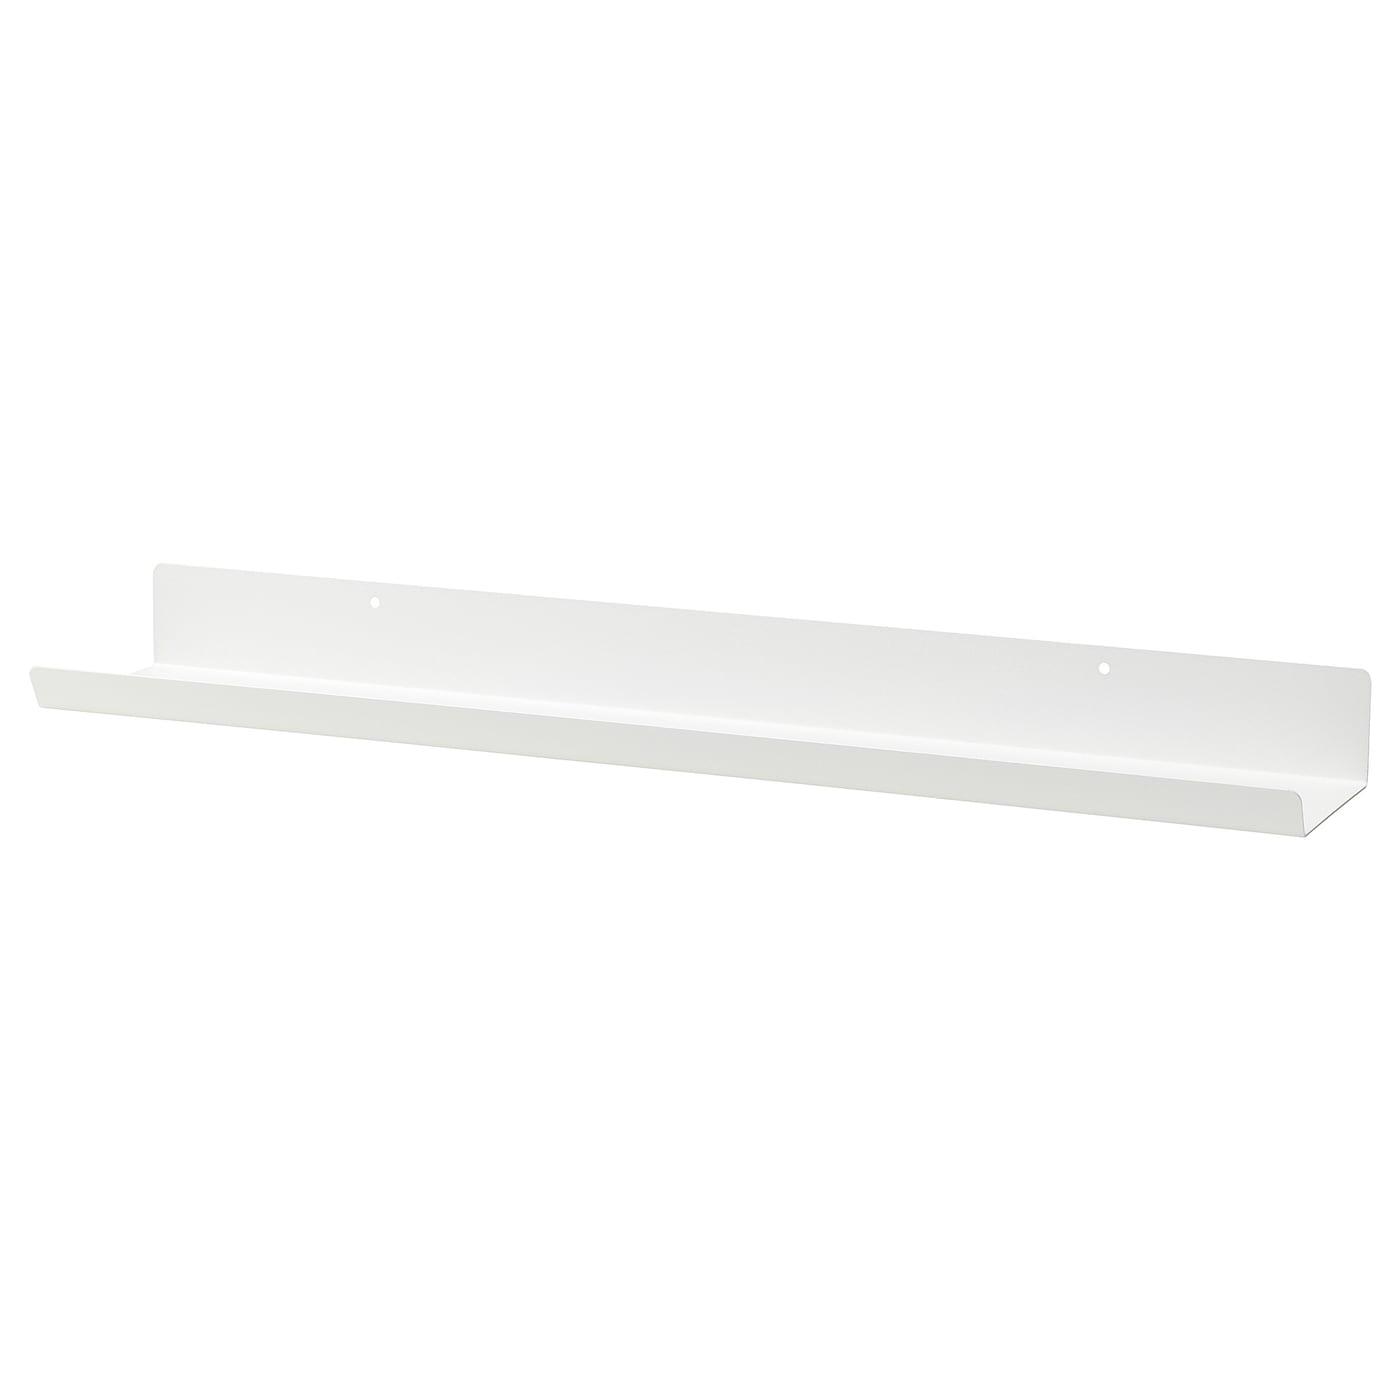 IKEA TJUSIG Anhänger Tür/Wand